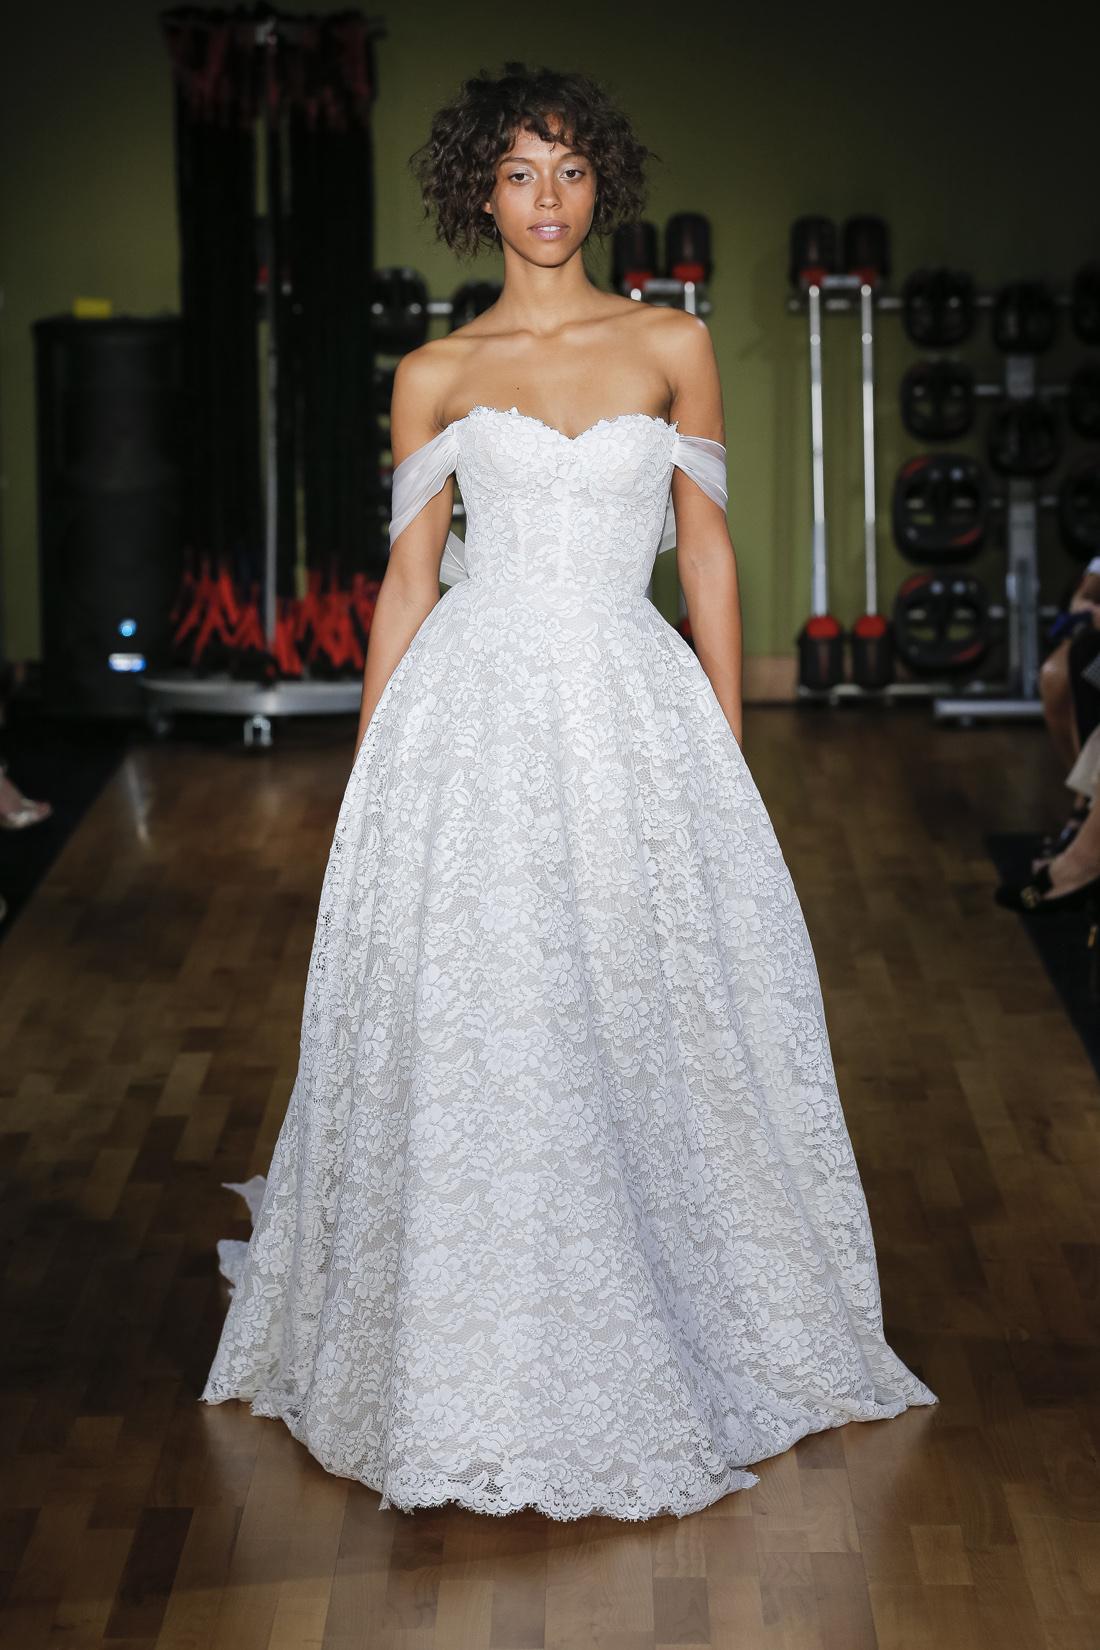 Rivini wedding dress sweetheart neckline with off the shoulder straps